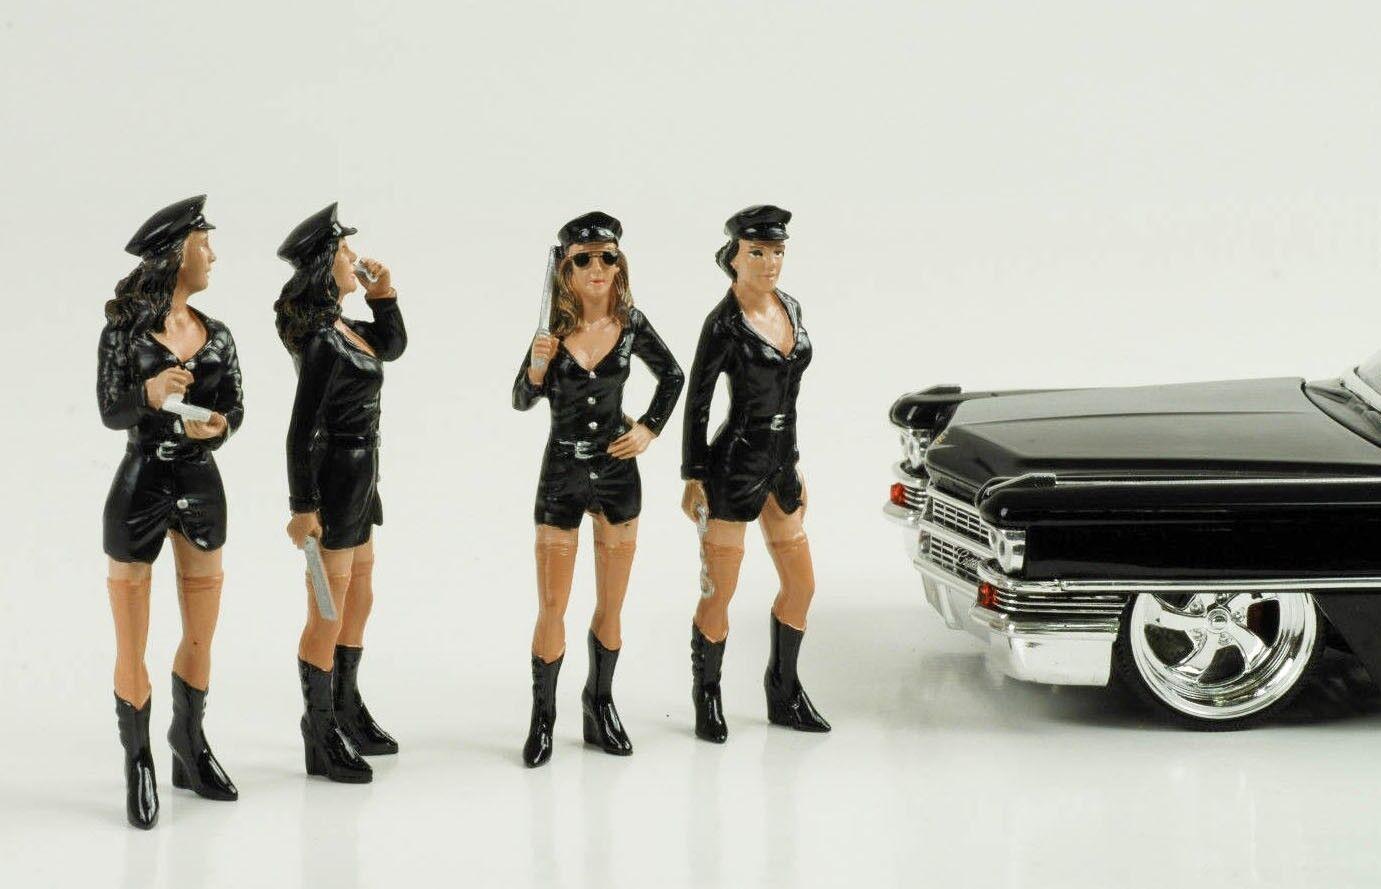 1 24 Girl Set Police Polizei Polizei Polizei 4 Figurines Figur Hot  Figures American Diorama 91b6ab